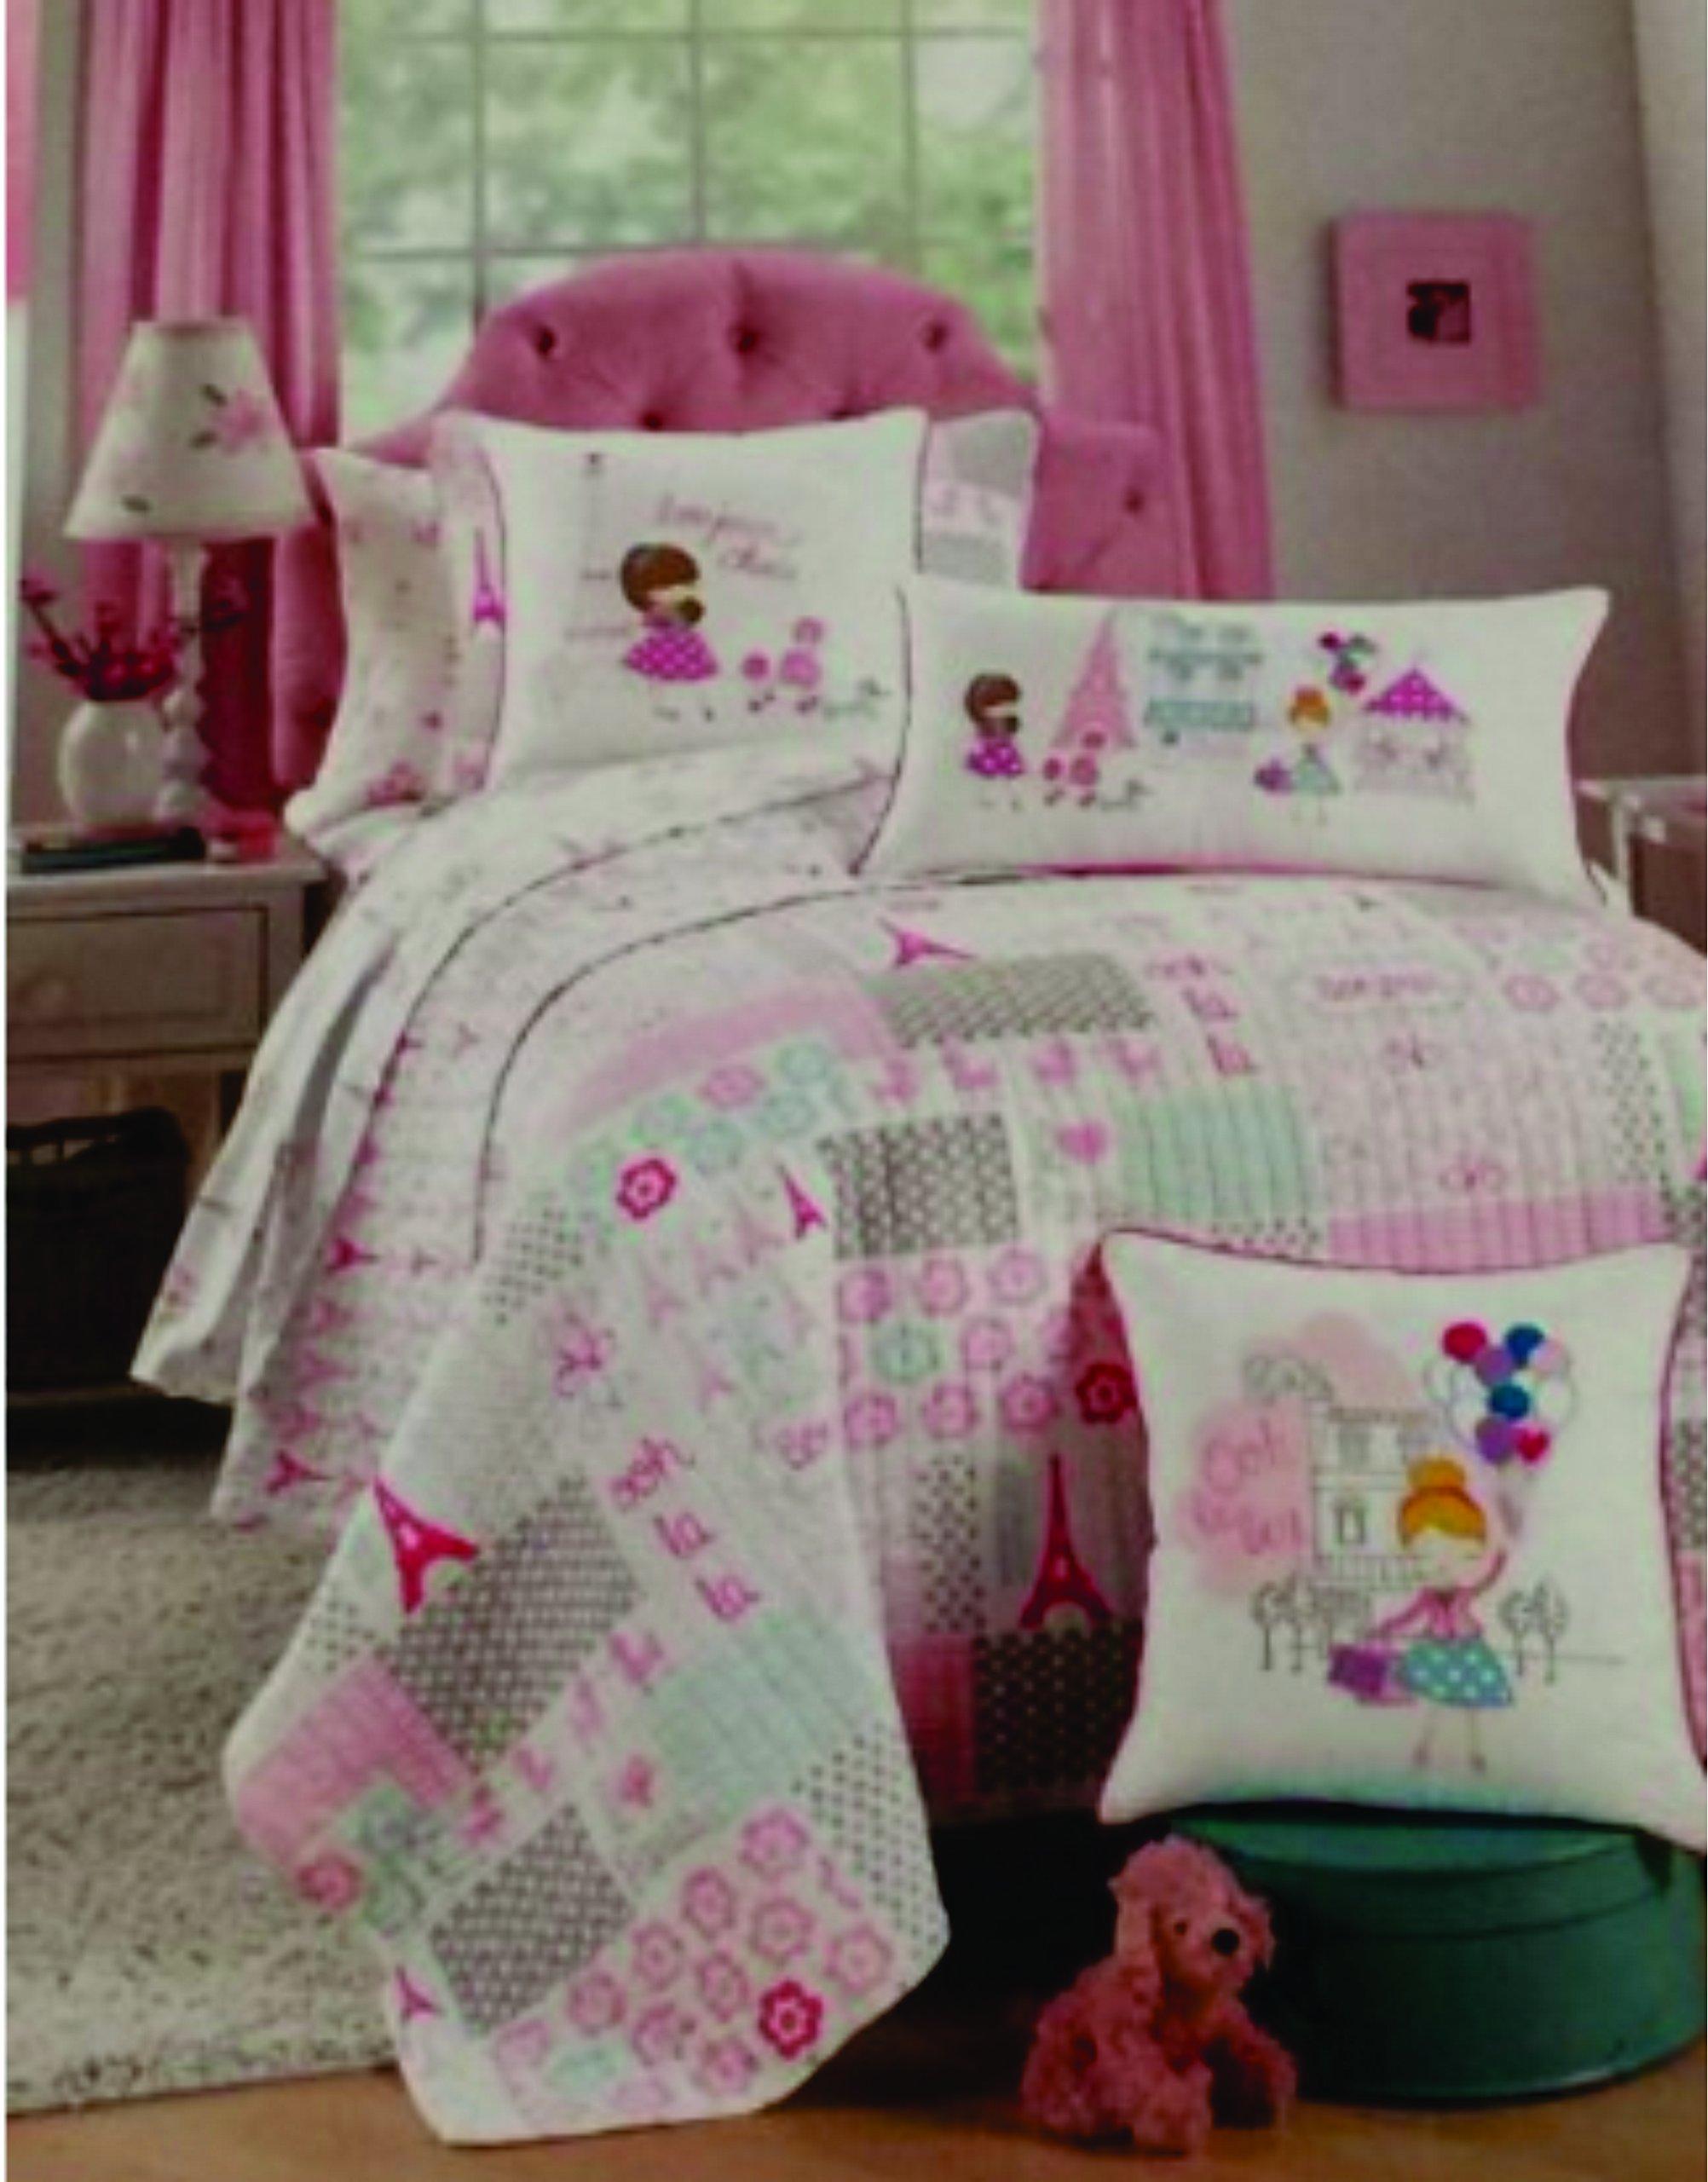 Nicole Miller Home Kids Quilt and Pillow Sham Set (I Love Paris Eiffel Tower) Twin